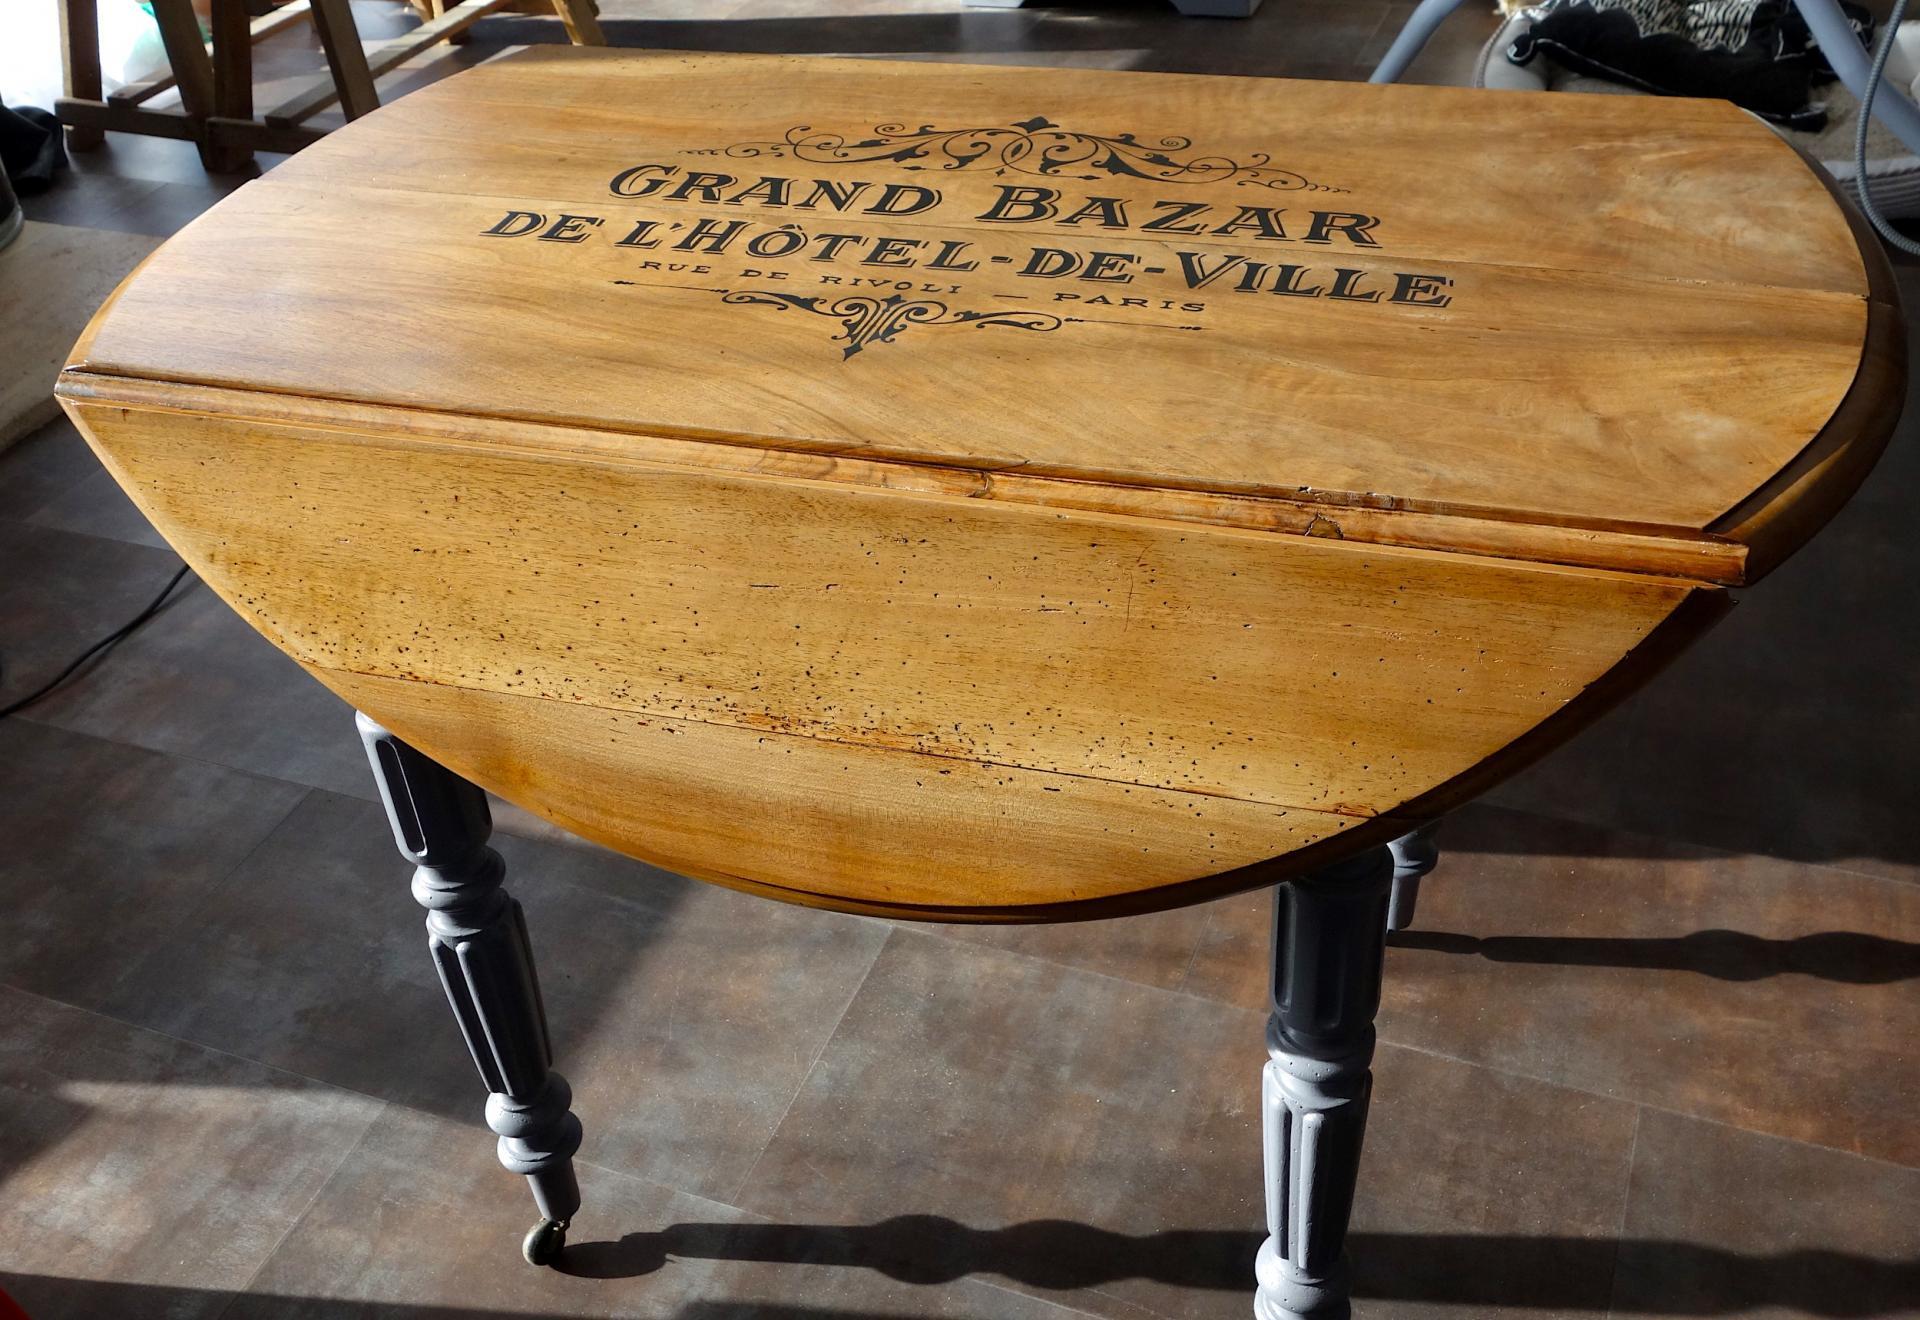 Table ronde relook bazar h tel de ville vernis noyer - Relooker table ronde bois ...